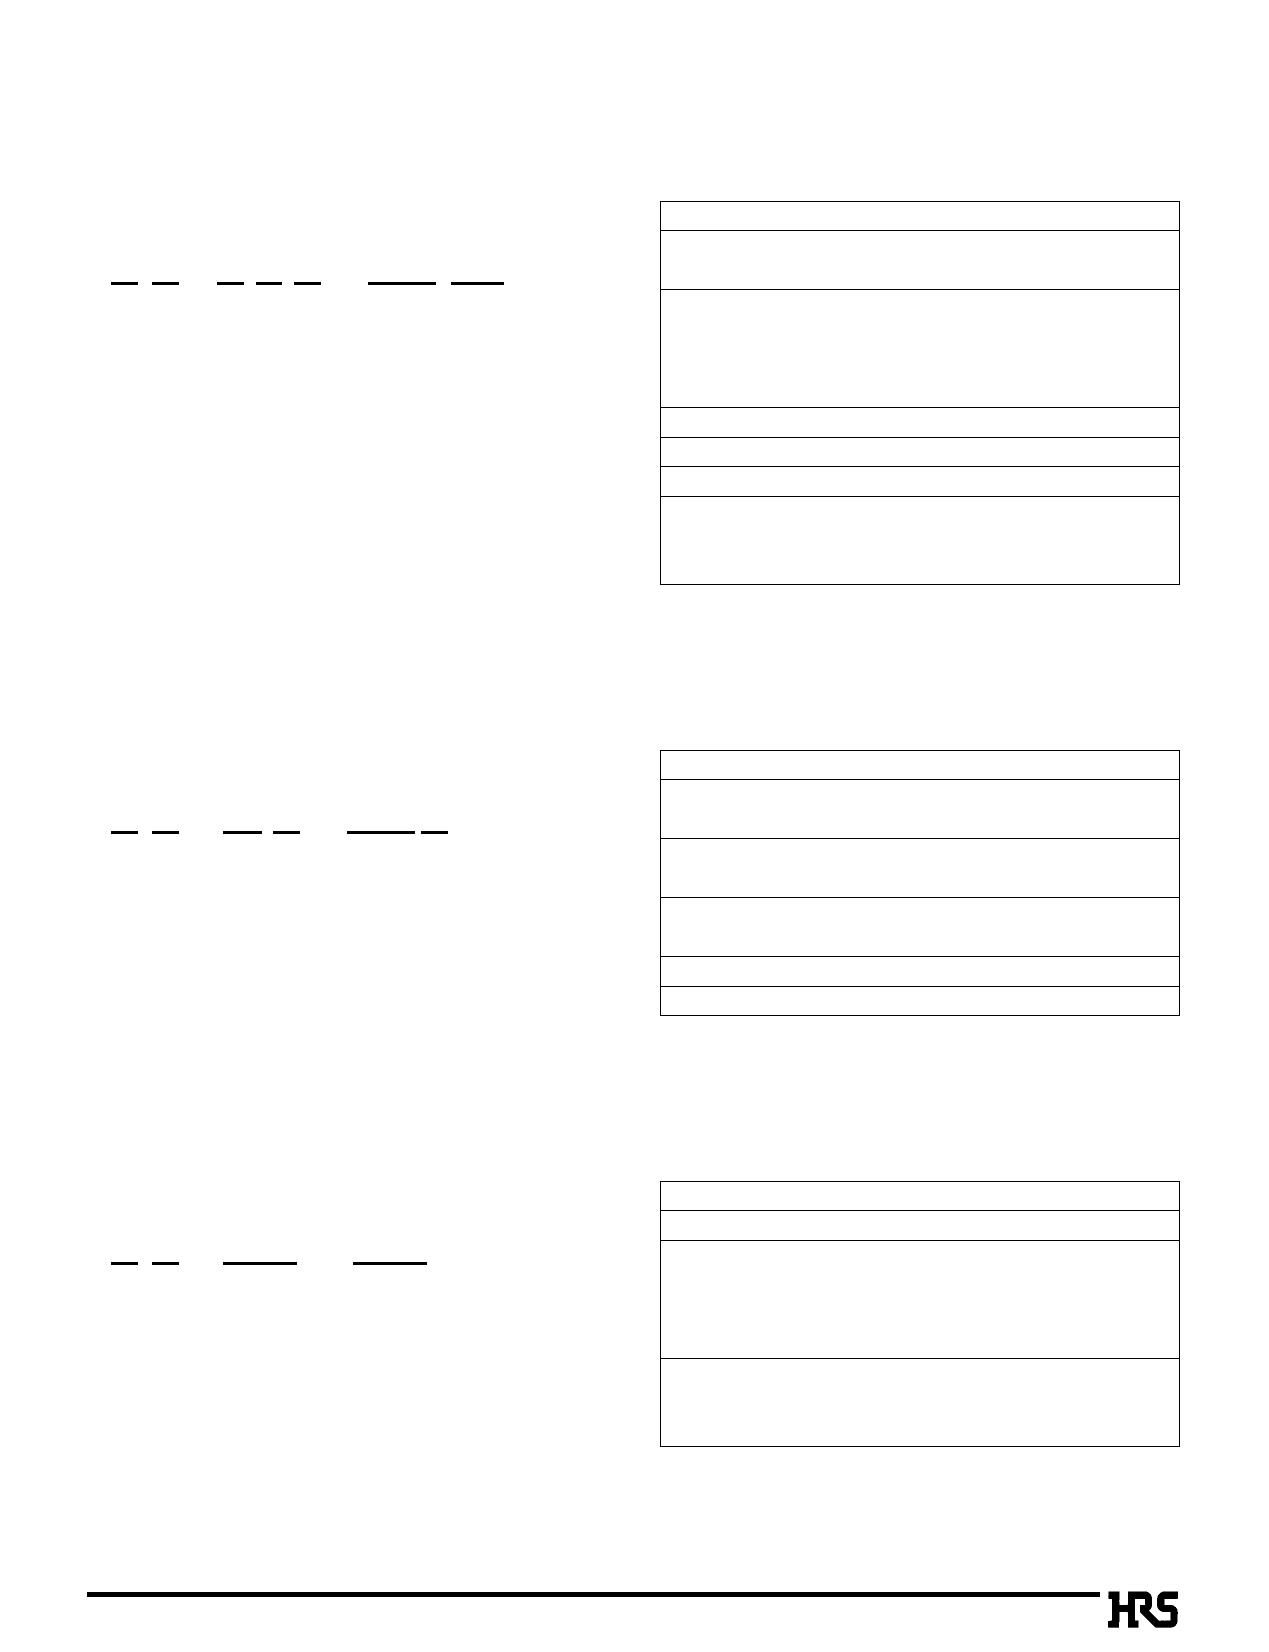 A1-20PA-2.54DS pdf, schematic